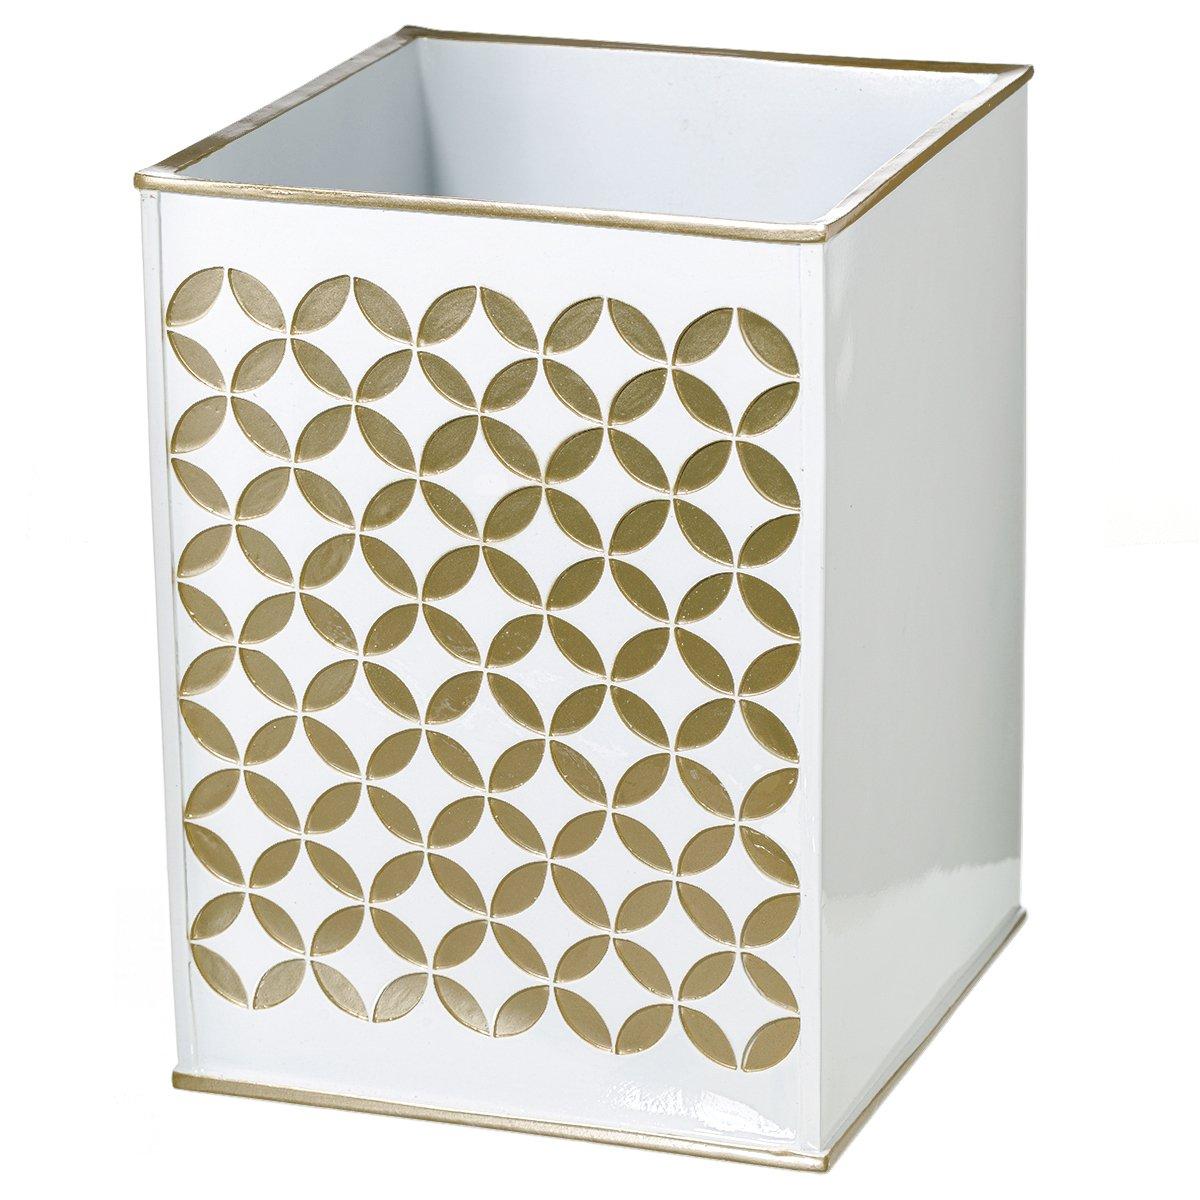 "Creative Scents Diamond Lattice Bathroom Trash Can (7.7""x 7.7""x 10.2"")–Decorative Wastebasket- Durable Resin Waste Paper Baskets Design- Space Friendly Bath Rubbish Dust Bin- For Elegant Shower Décor"